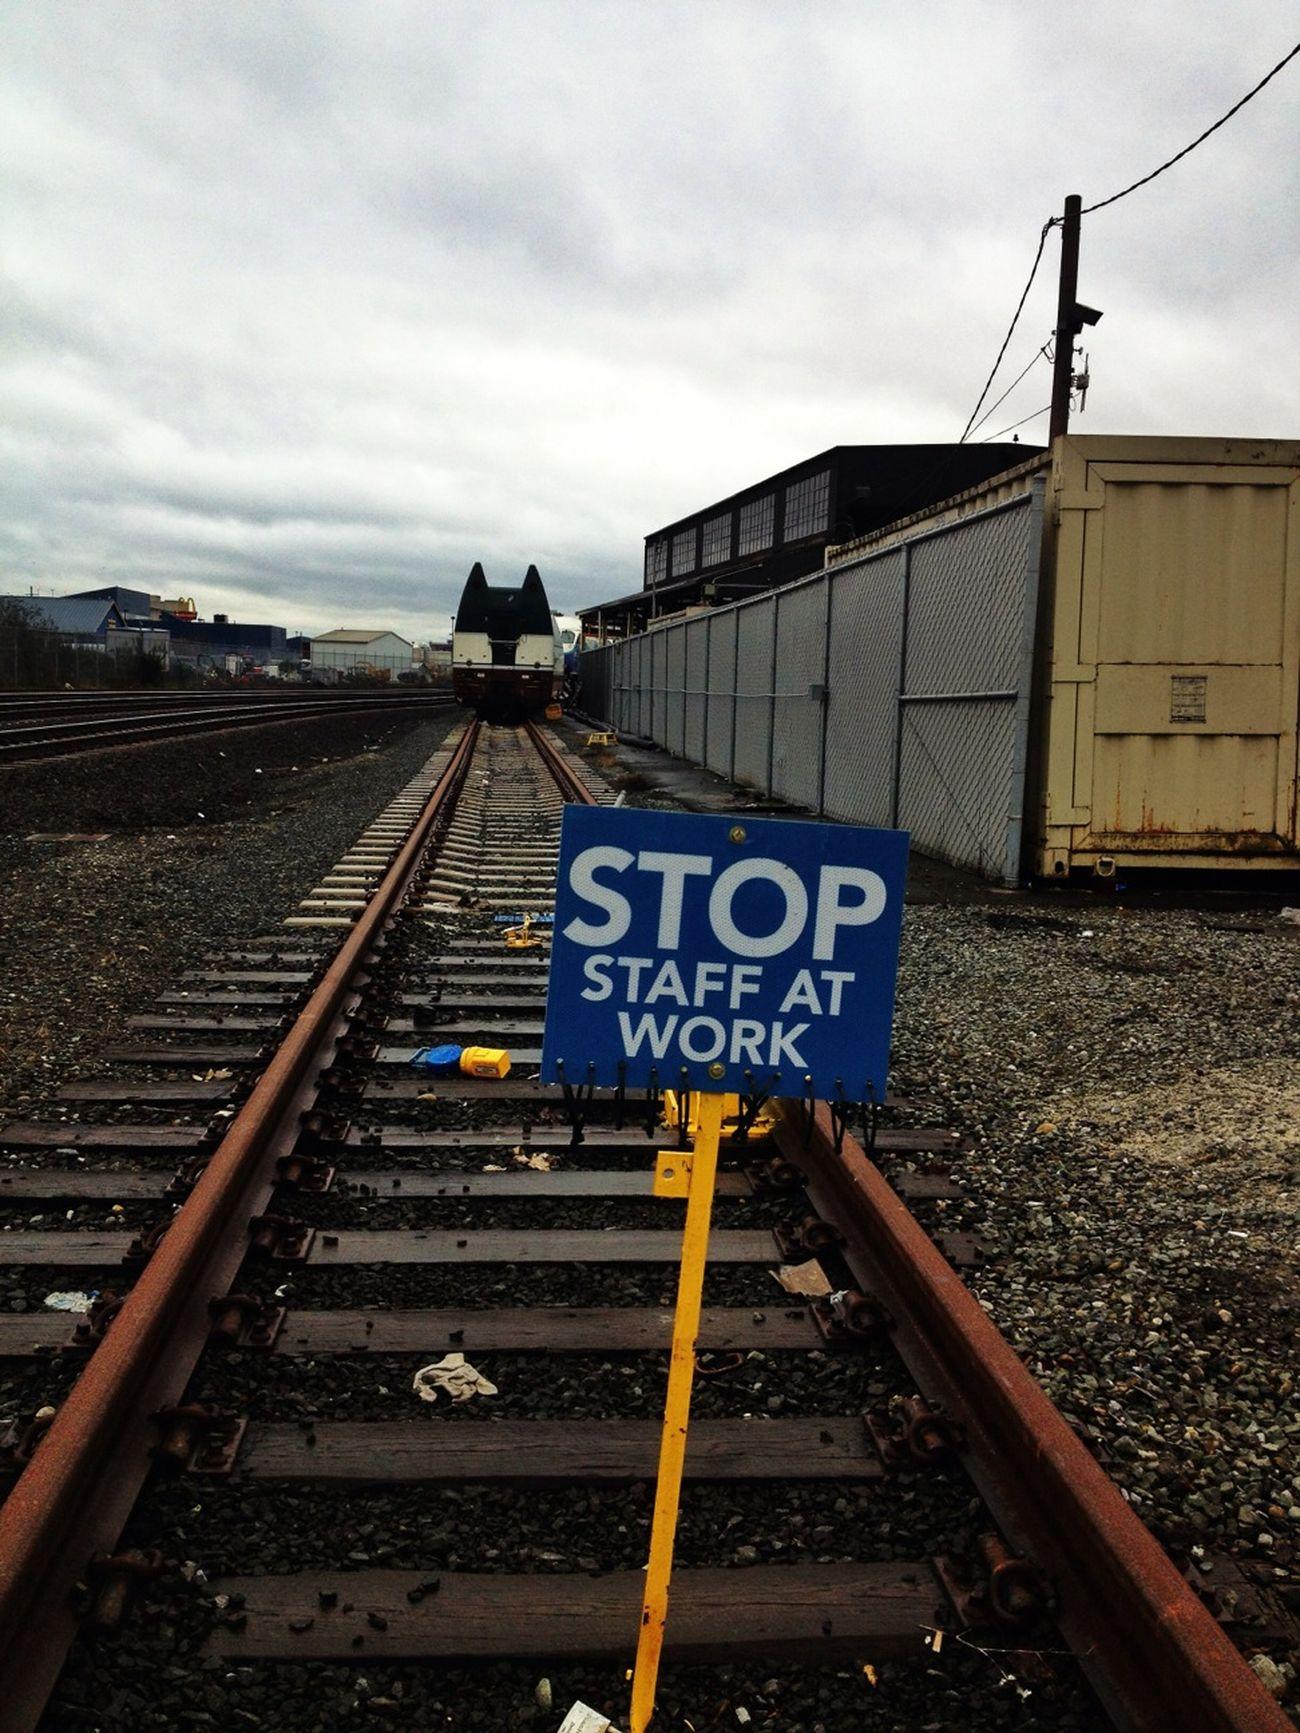 Signs - Warnings